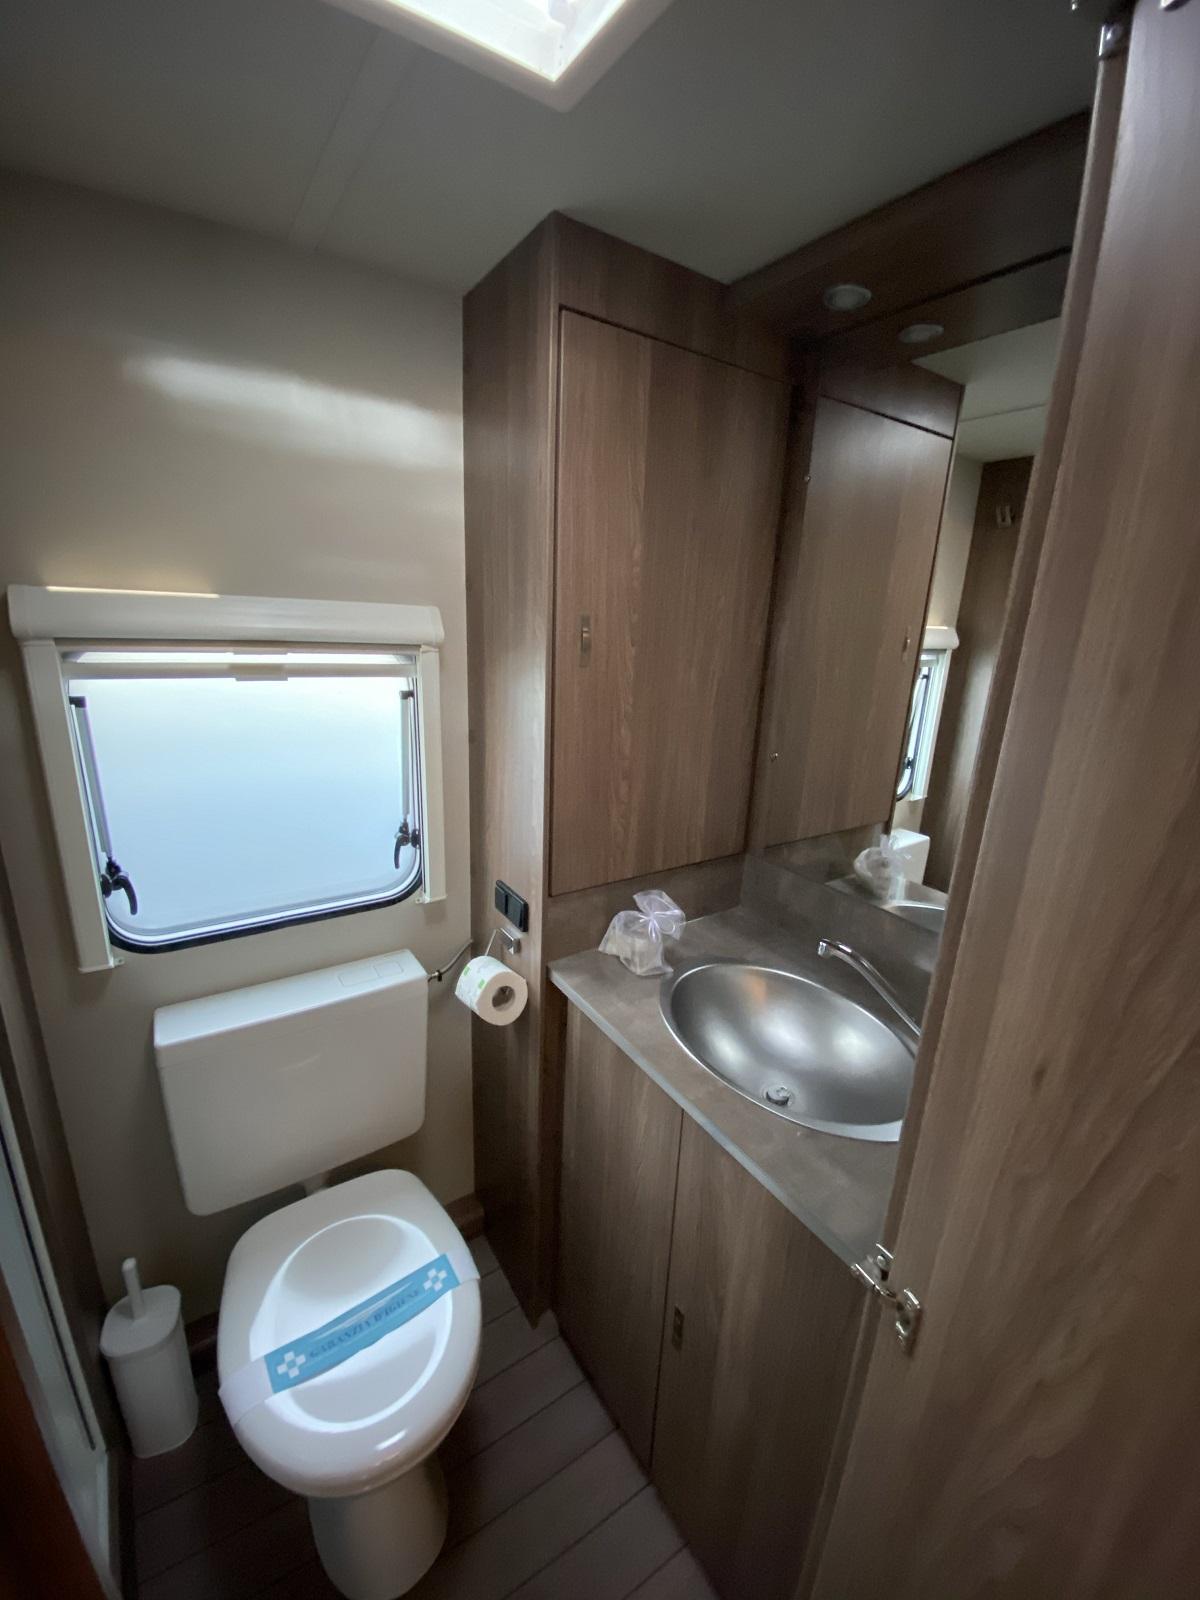 10-Bagno-Bathroom-Toilette-Tabbert-Caravan-Dei-Fiori-Camping